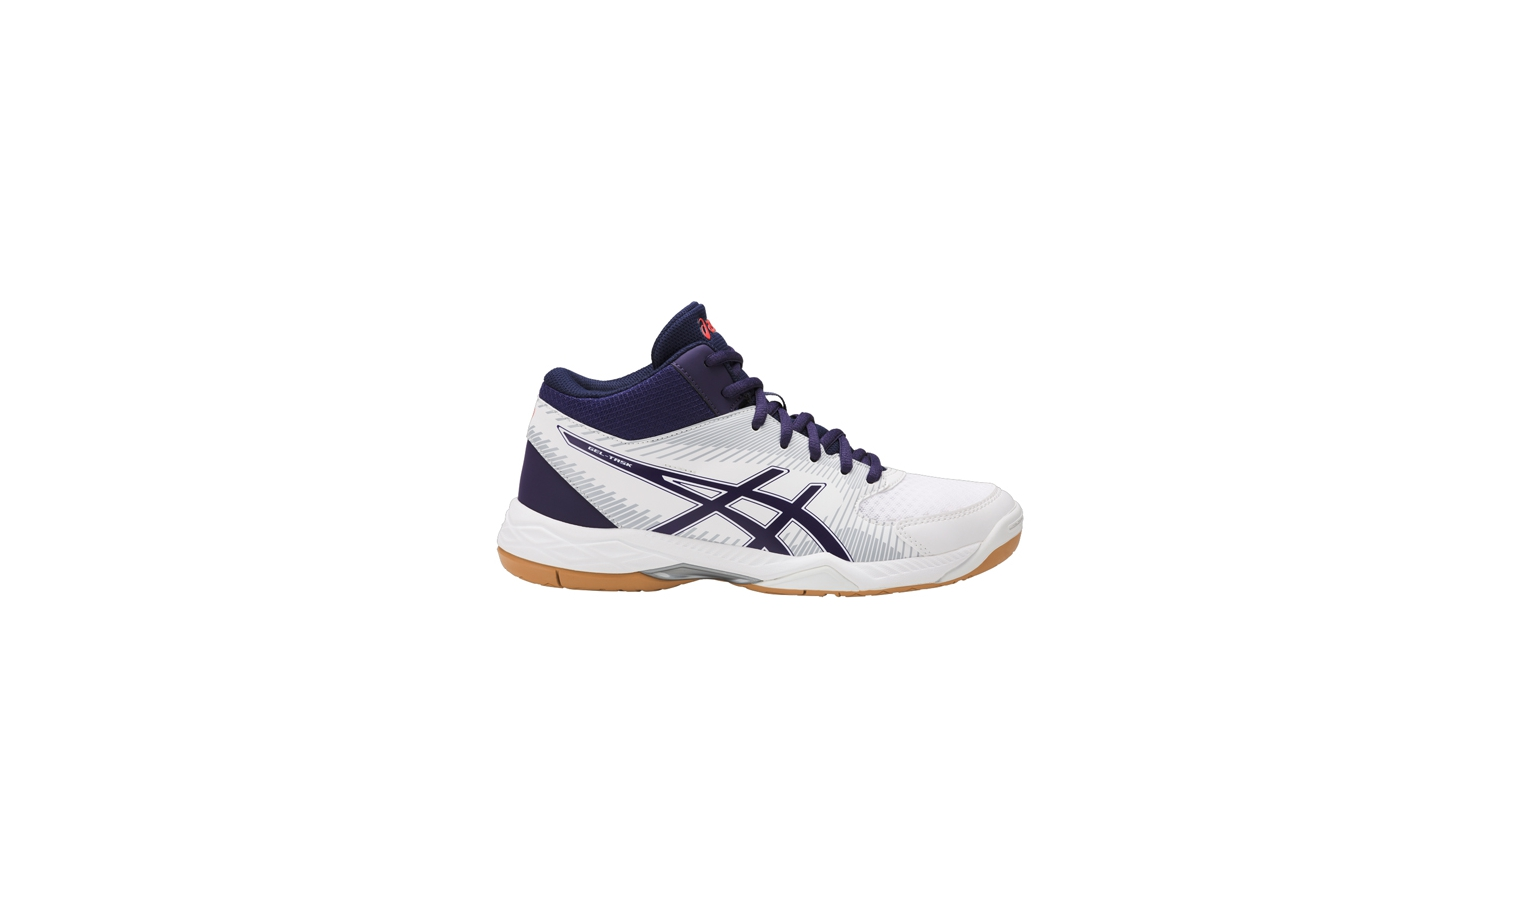 9957df4c676 ... Dámske volejbalové topánky Asics GEL-TASK MT W bielo-modré. Zľava